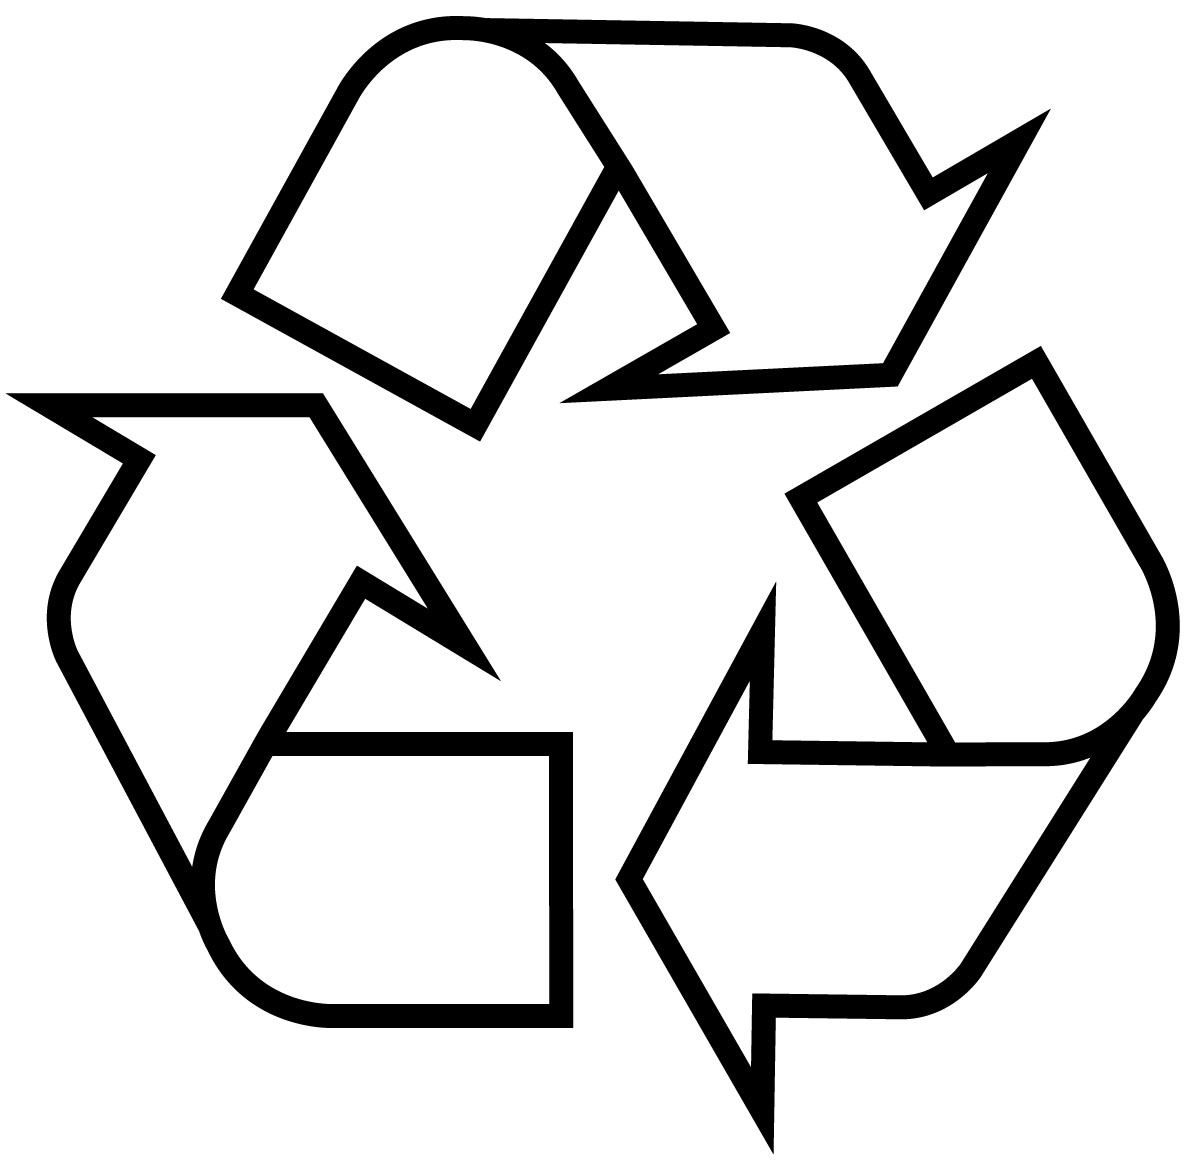 White Recycle Symbol